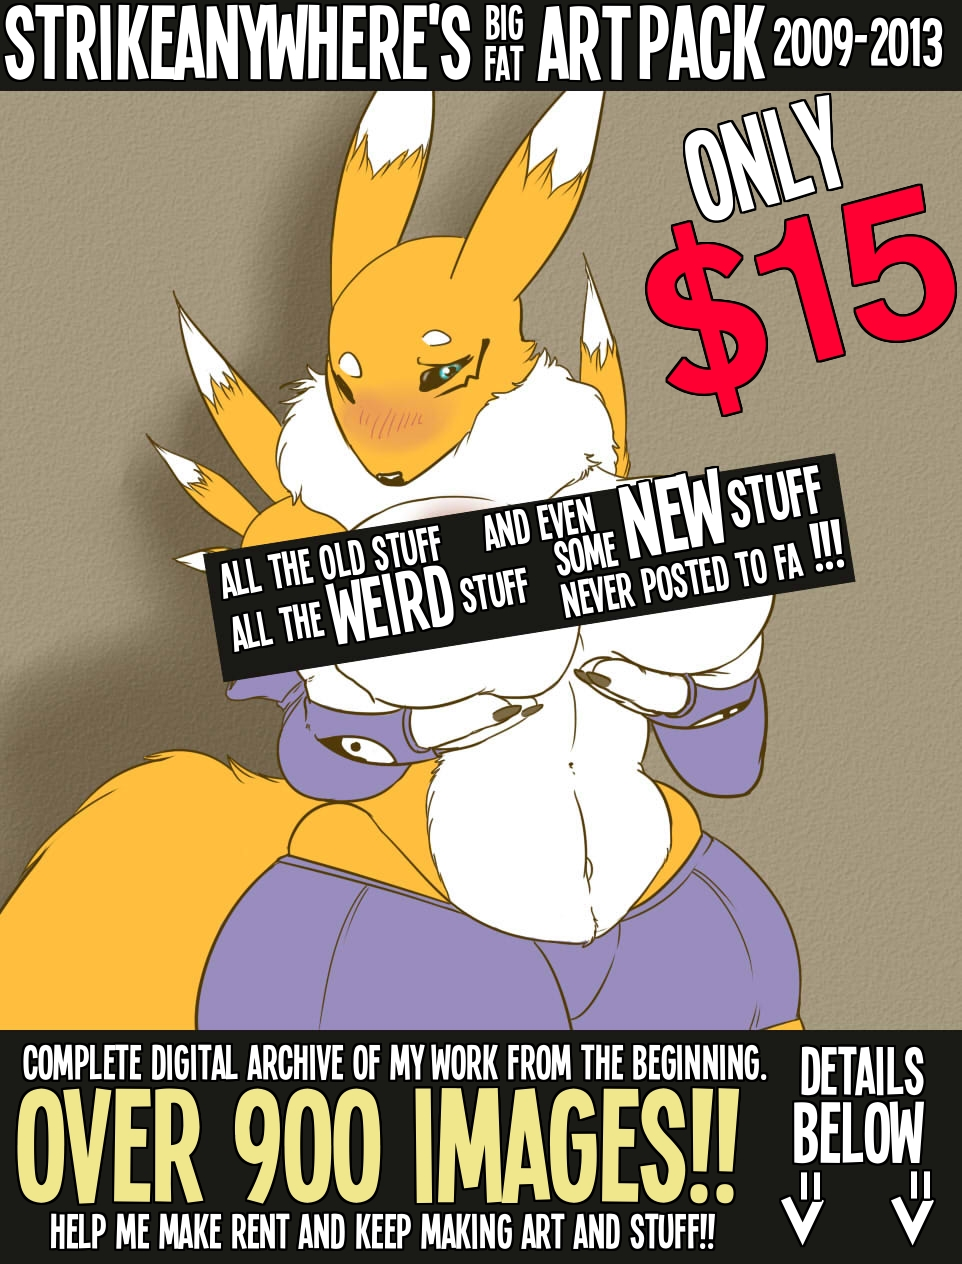 Most recent image: BIG FAT ART PACK - Sale Continues